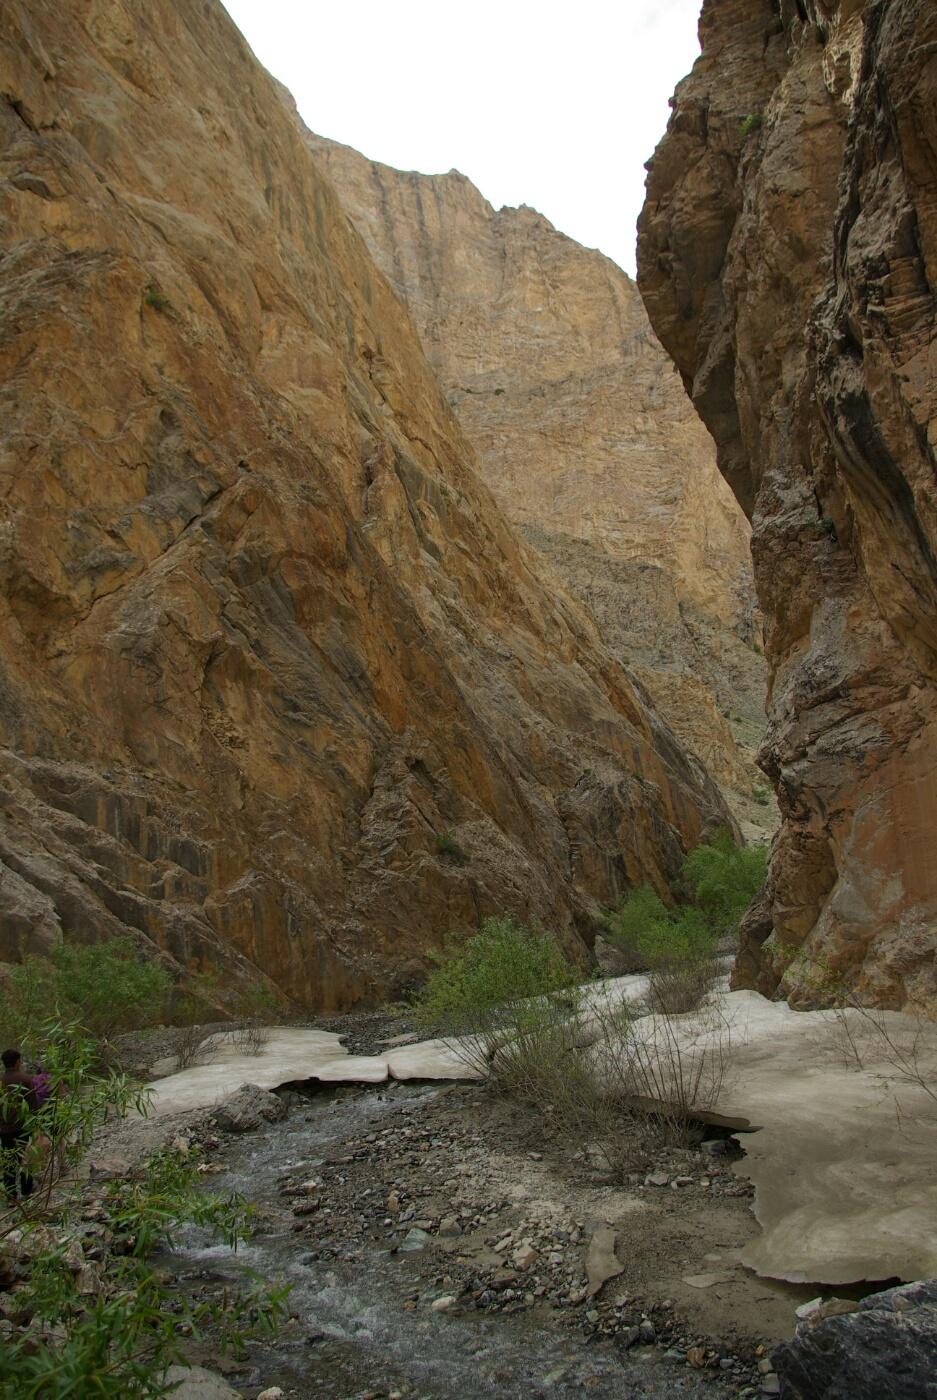 Phokar, Padmasambhava: Hierher kommt kaum ein Sonnenstrahl